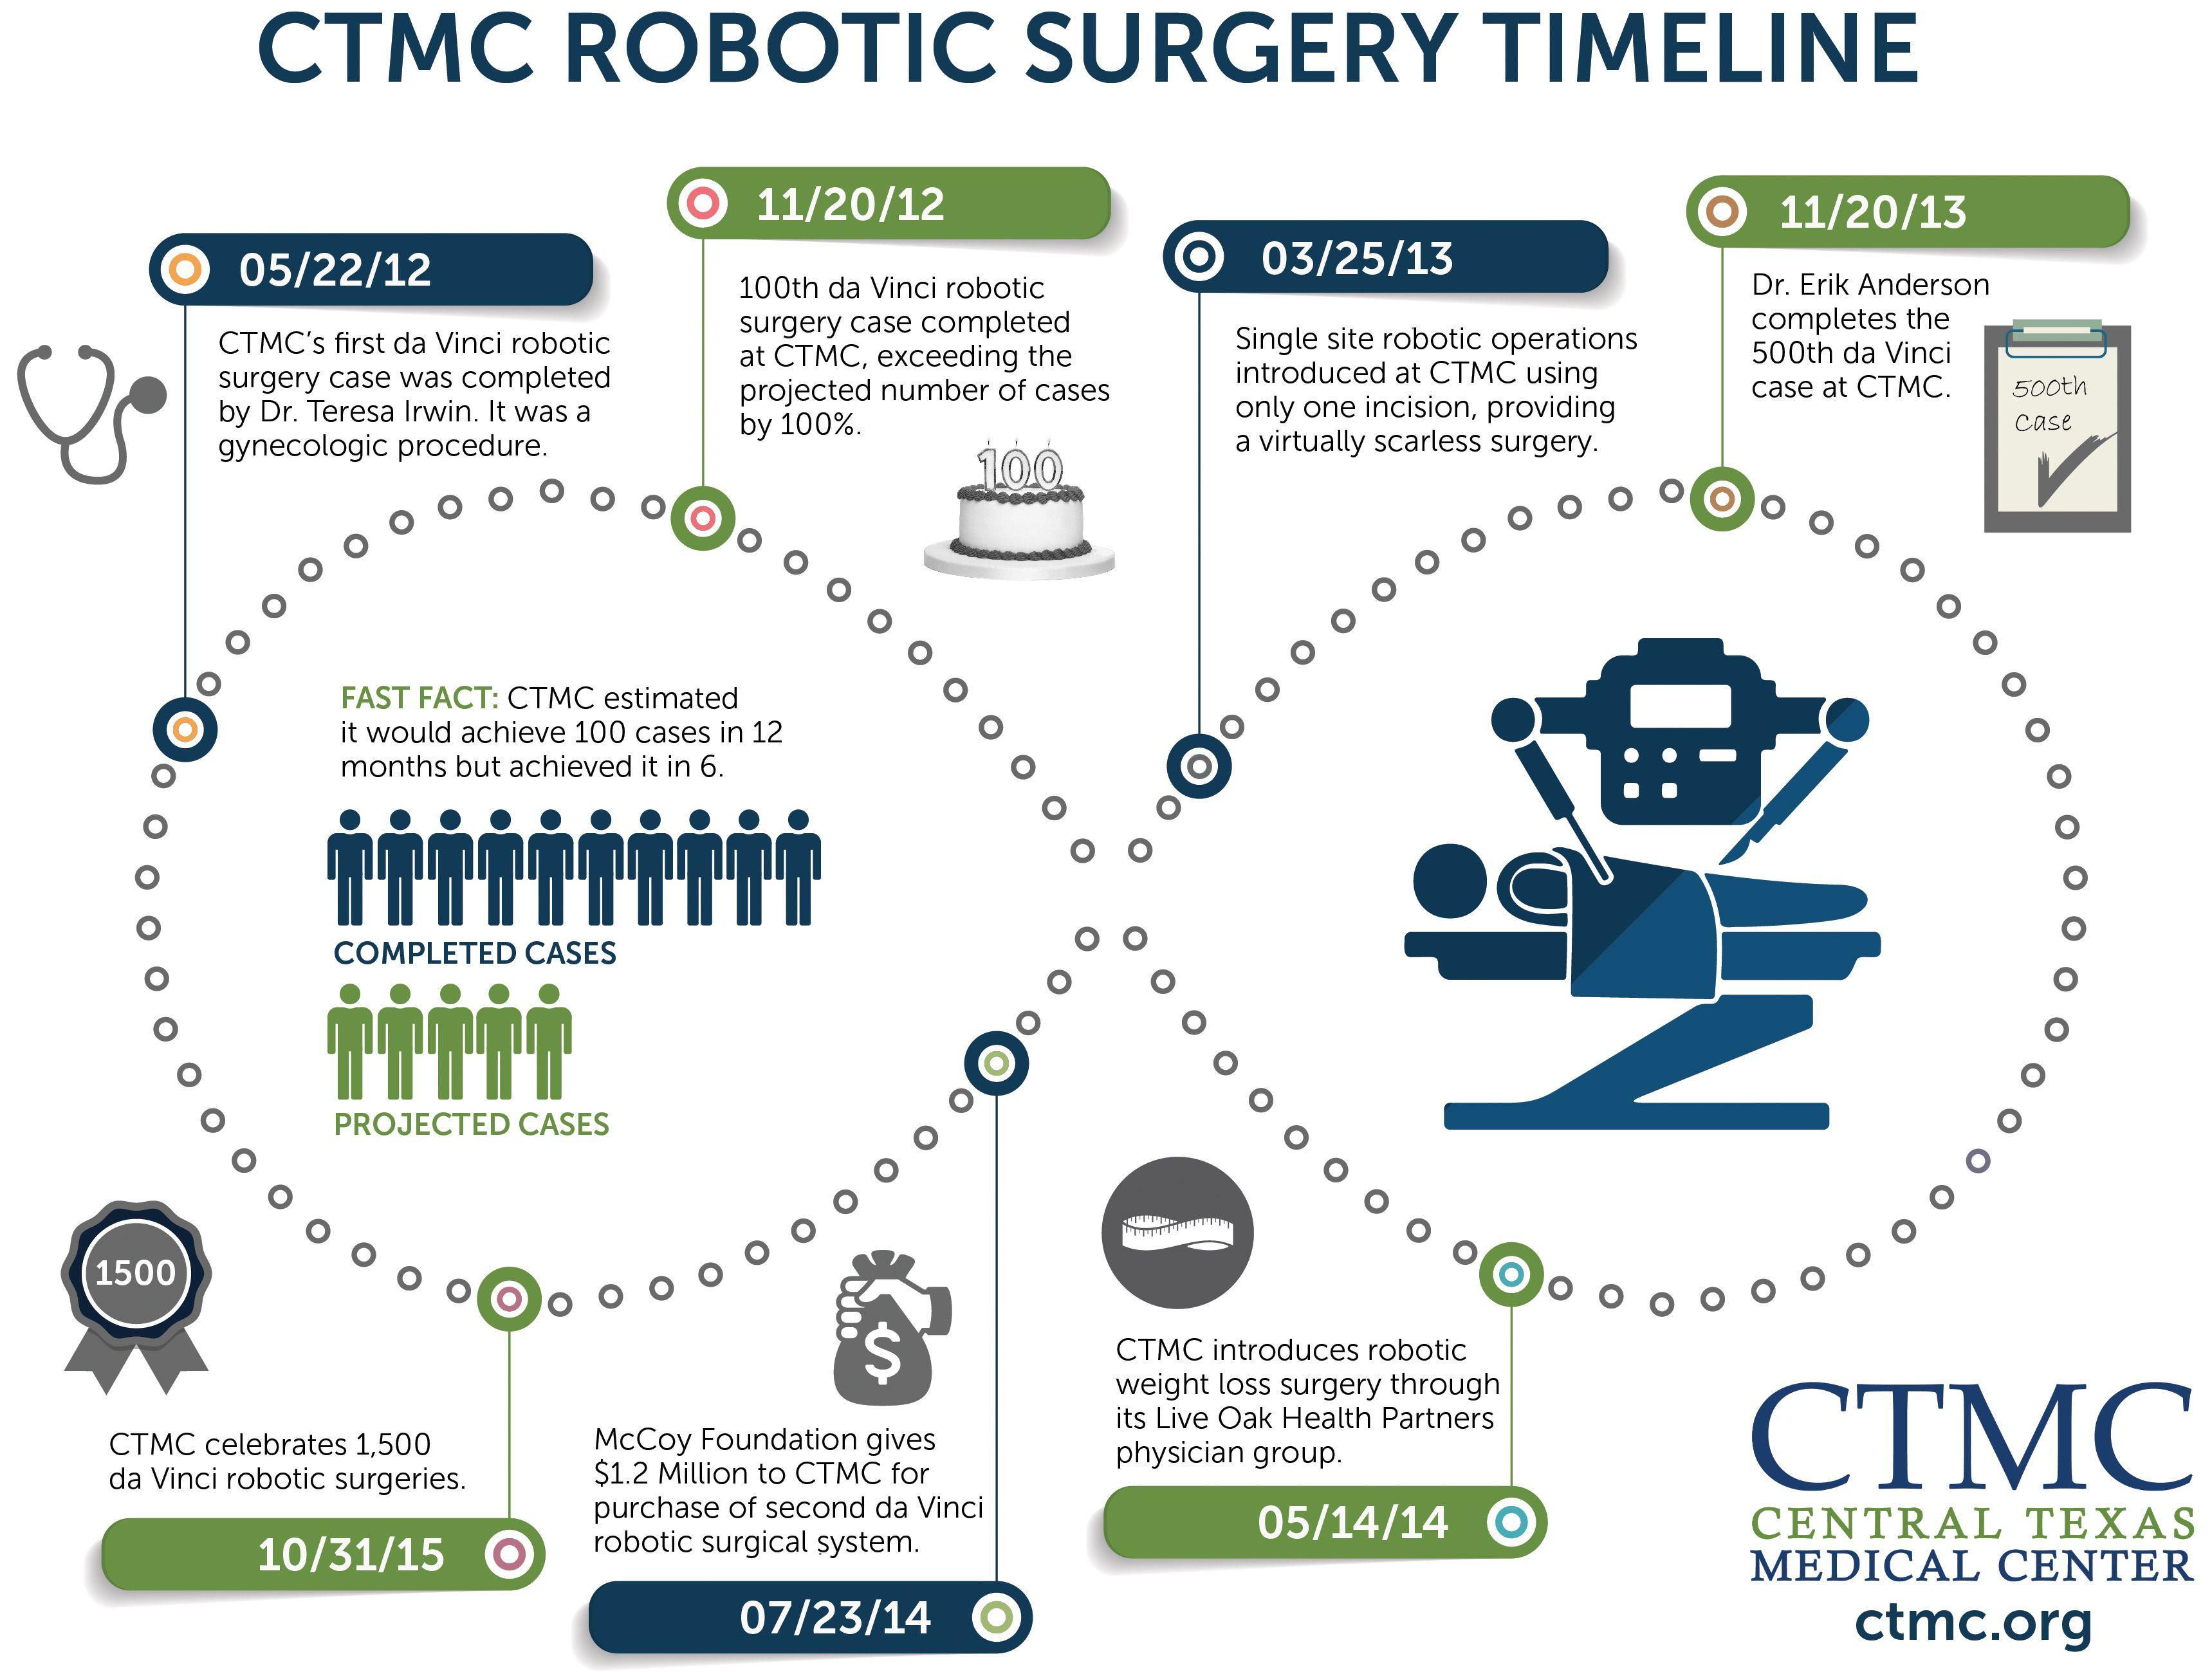 We're proud of our daVinci RoboticSurgery milestones